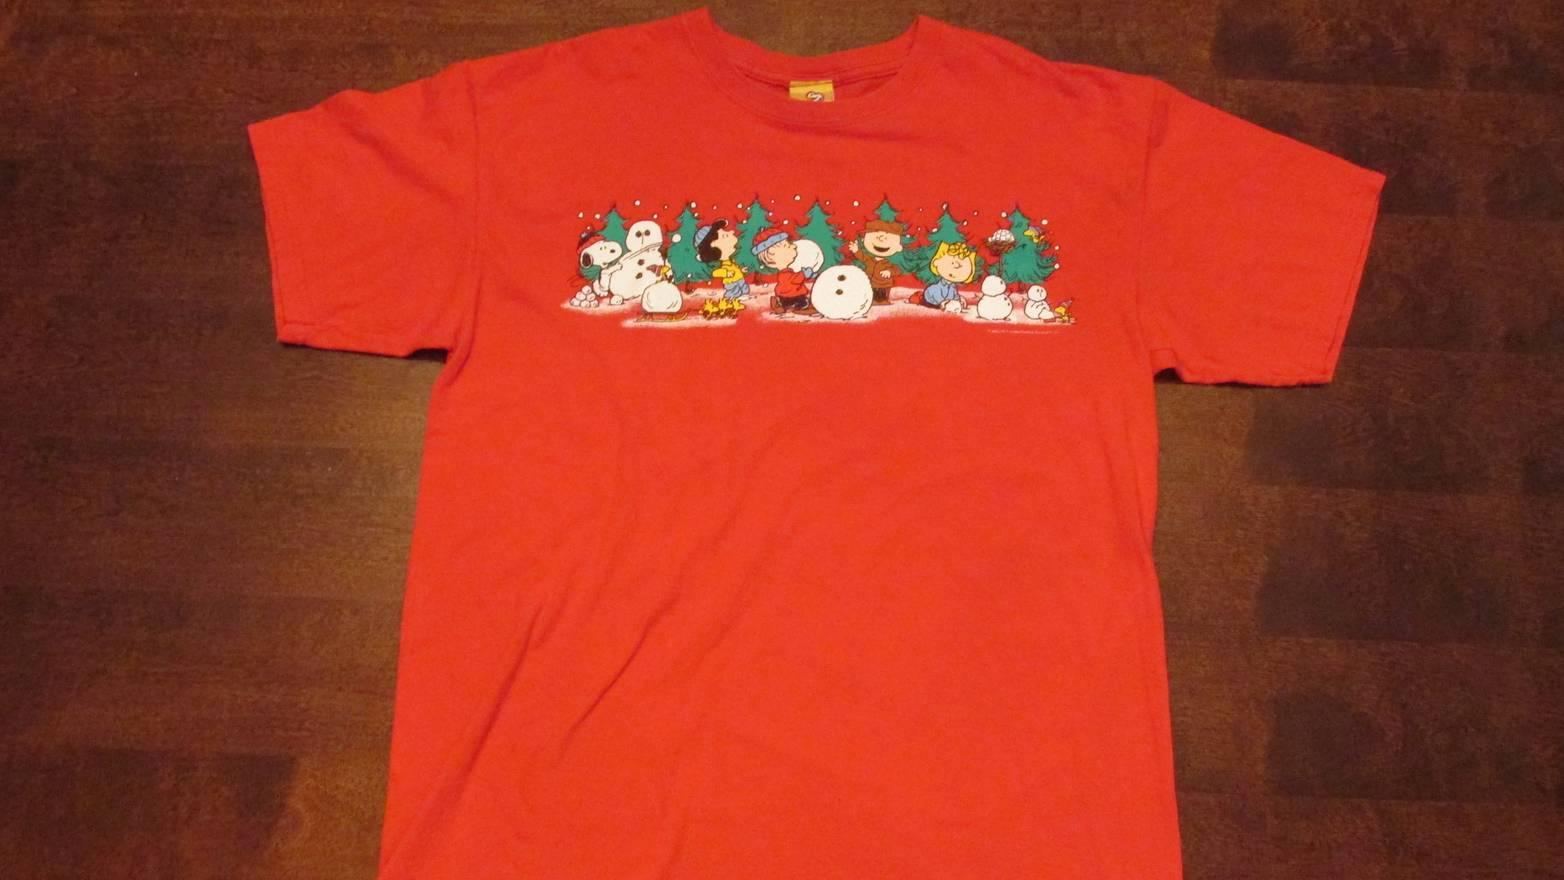 peanuts peanuts christmas t shirt size us l eu 52 54 3 - Peanuts Christmas Shirt